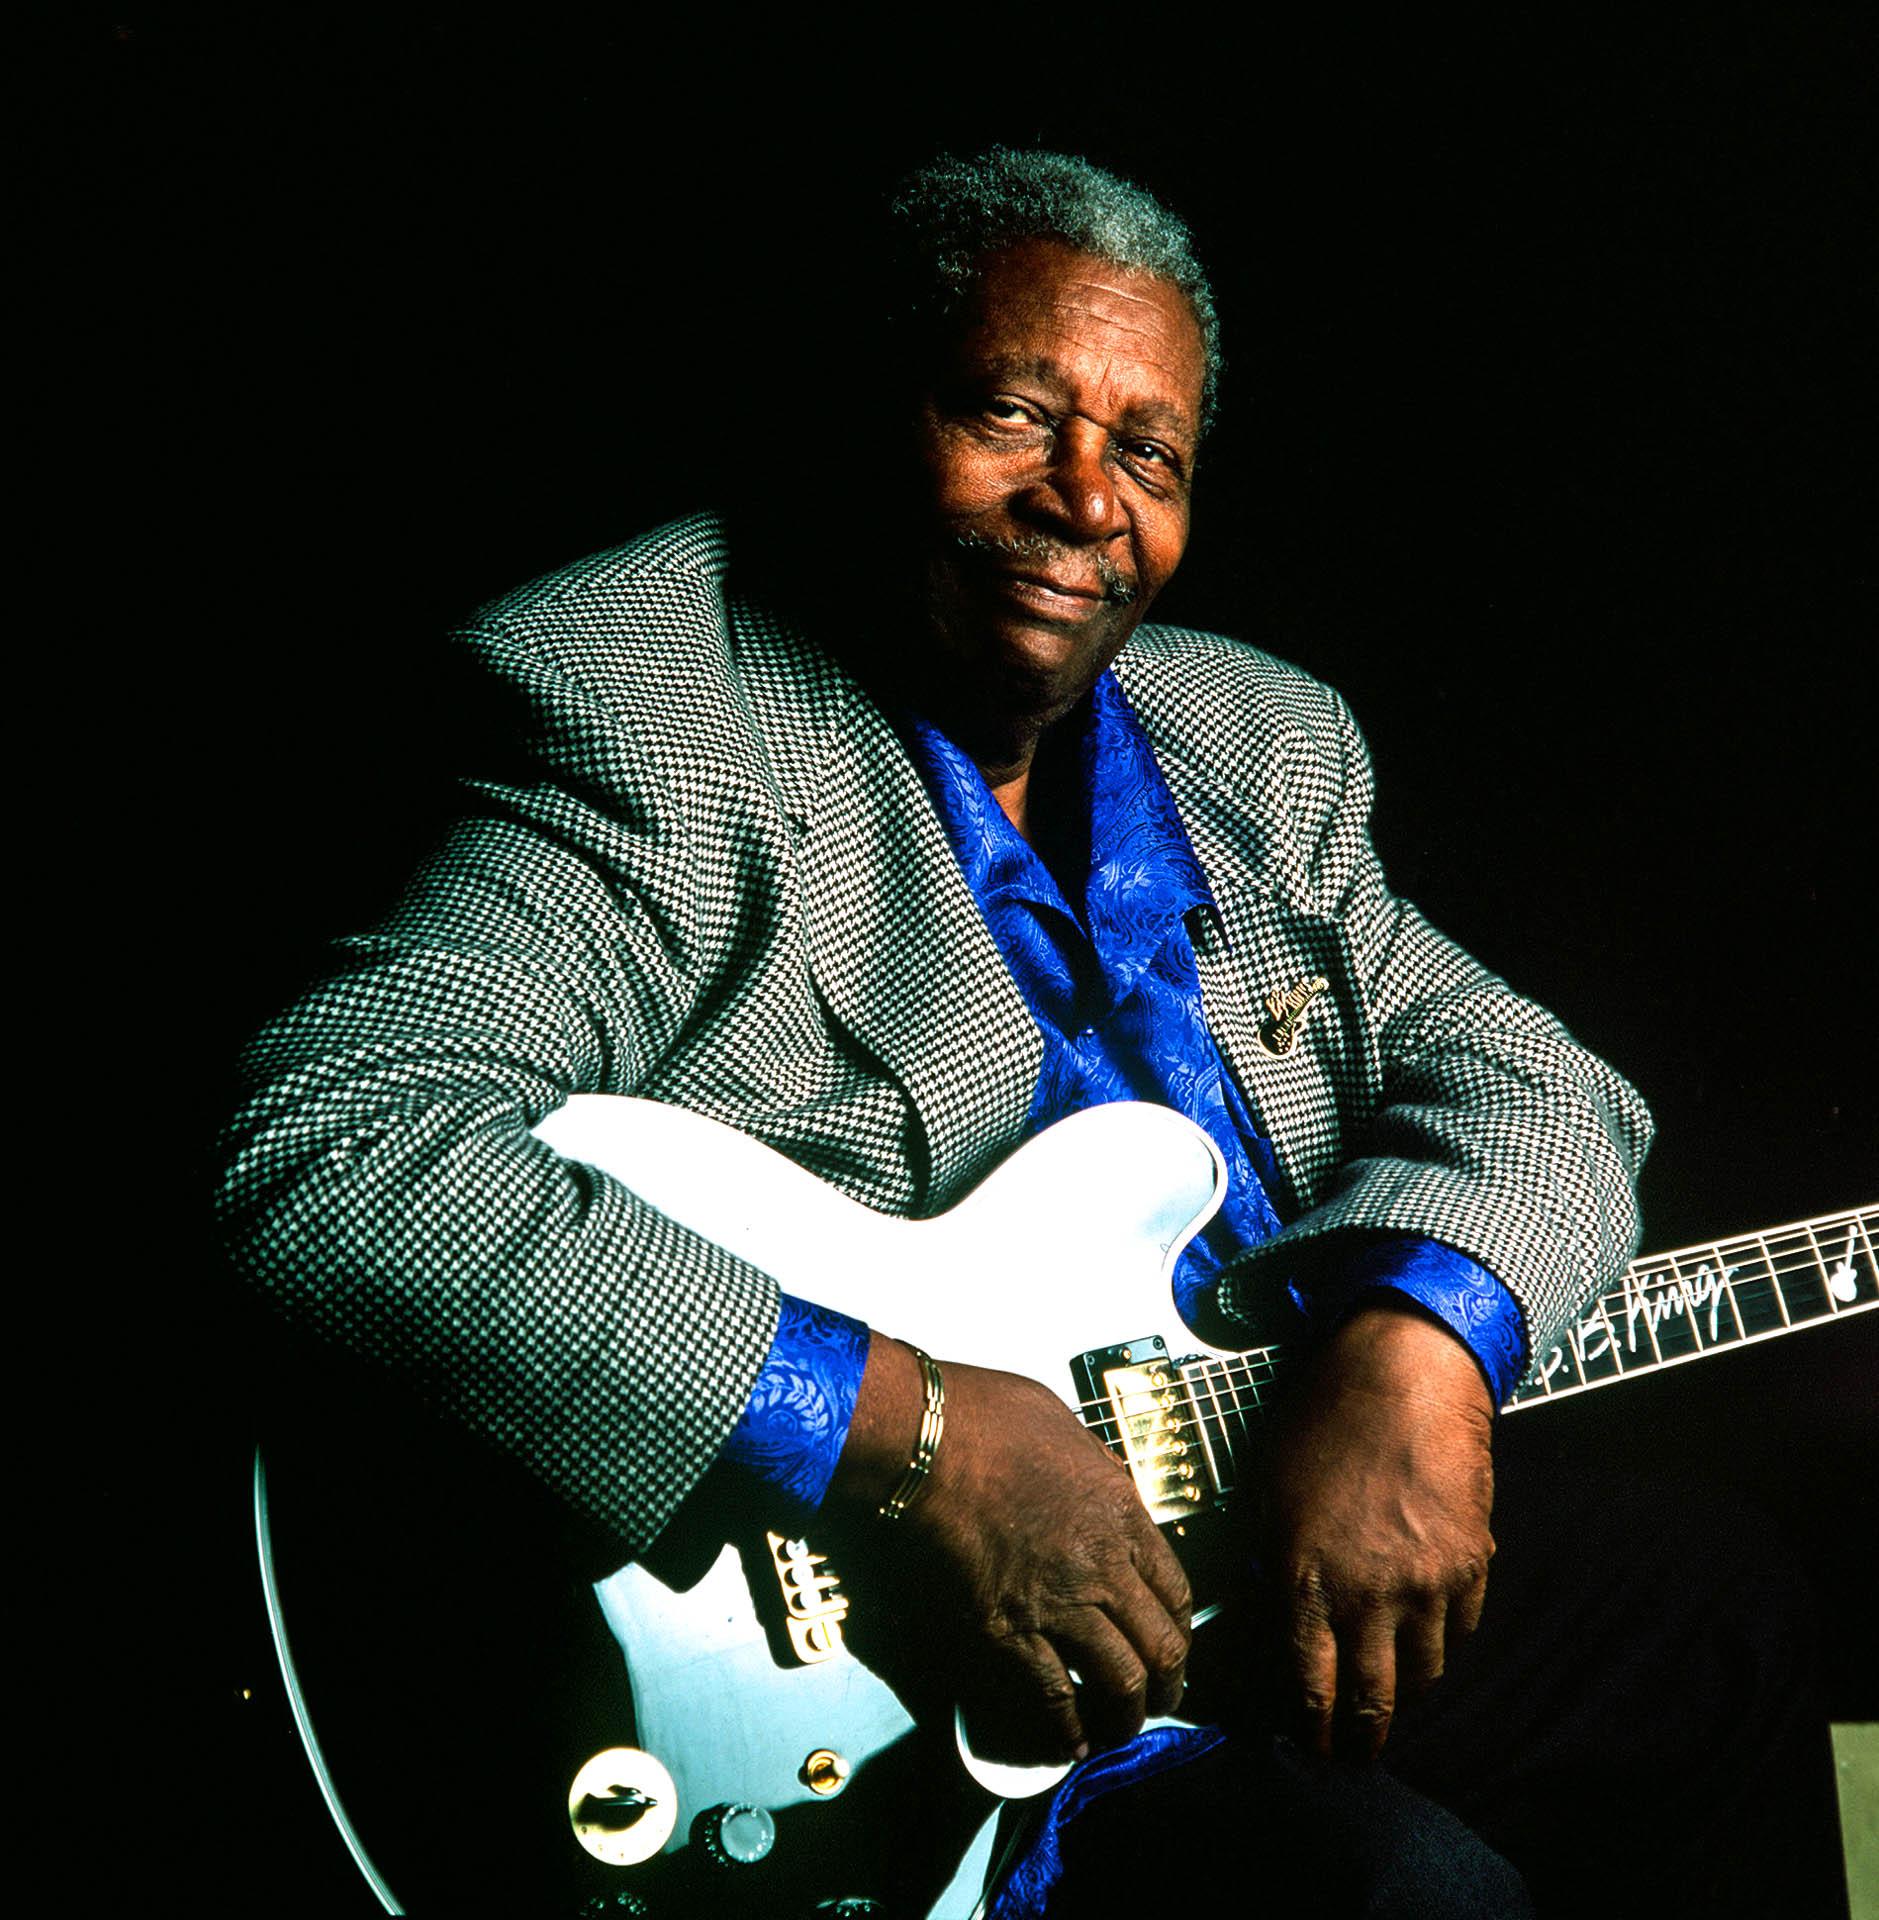 Pistoia, Italy - July 13, 2000American bluesman B.B. King.© GIANNI GIANSANTI